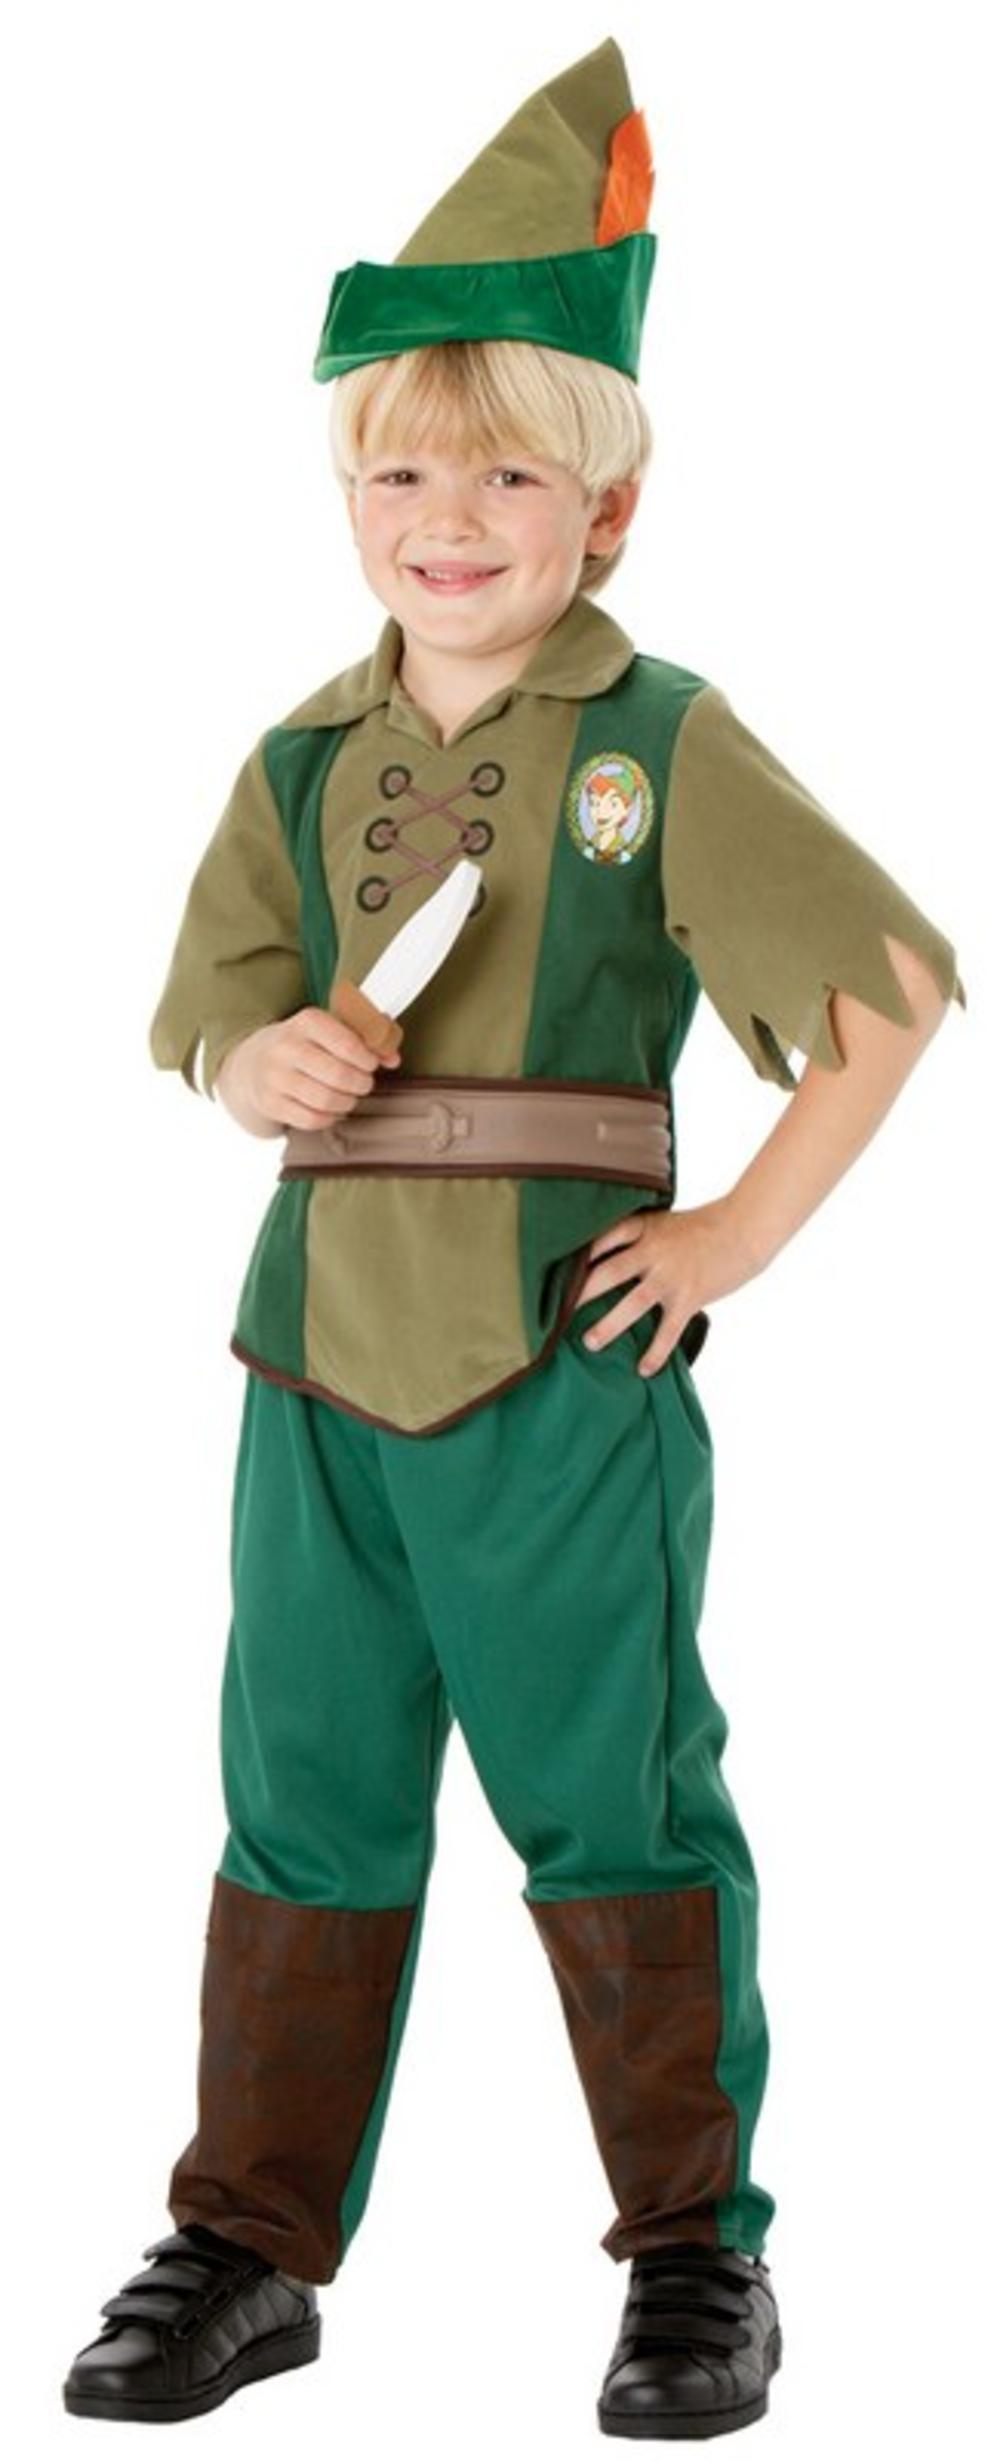 Peter Pan Boys Fancy Dress World Book Day Dress Up Disney Costume Kids Ages 3-8